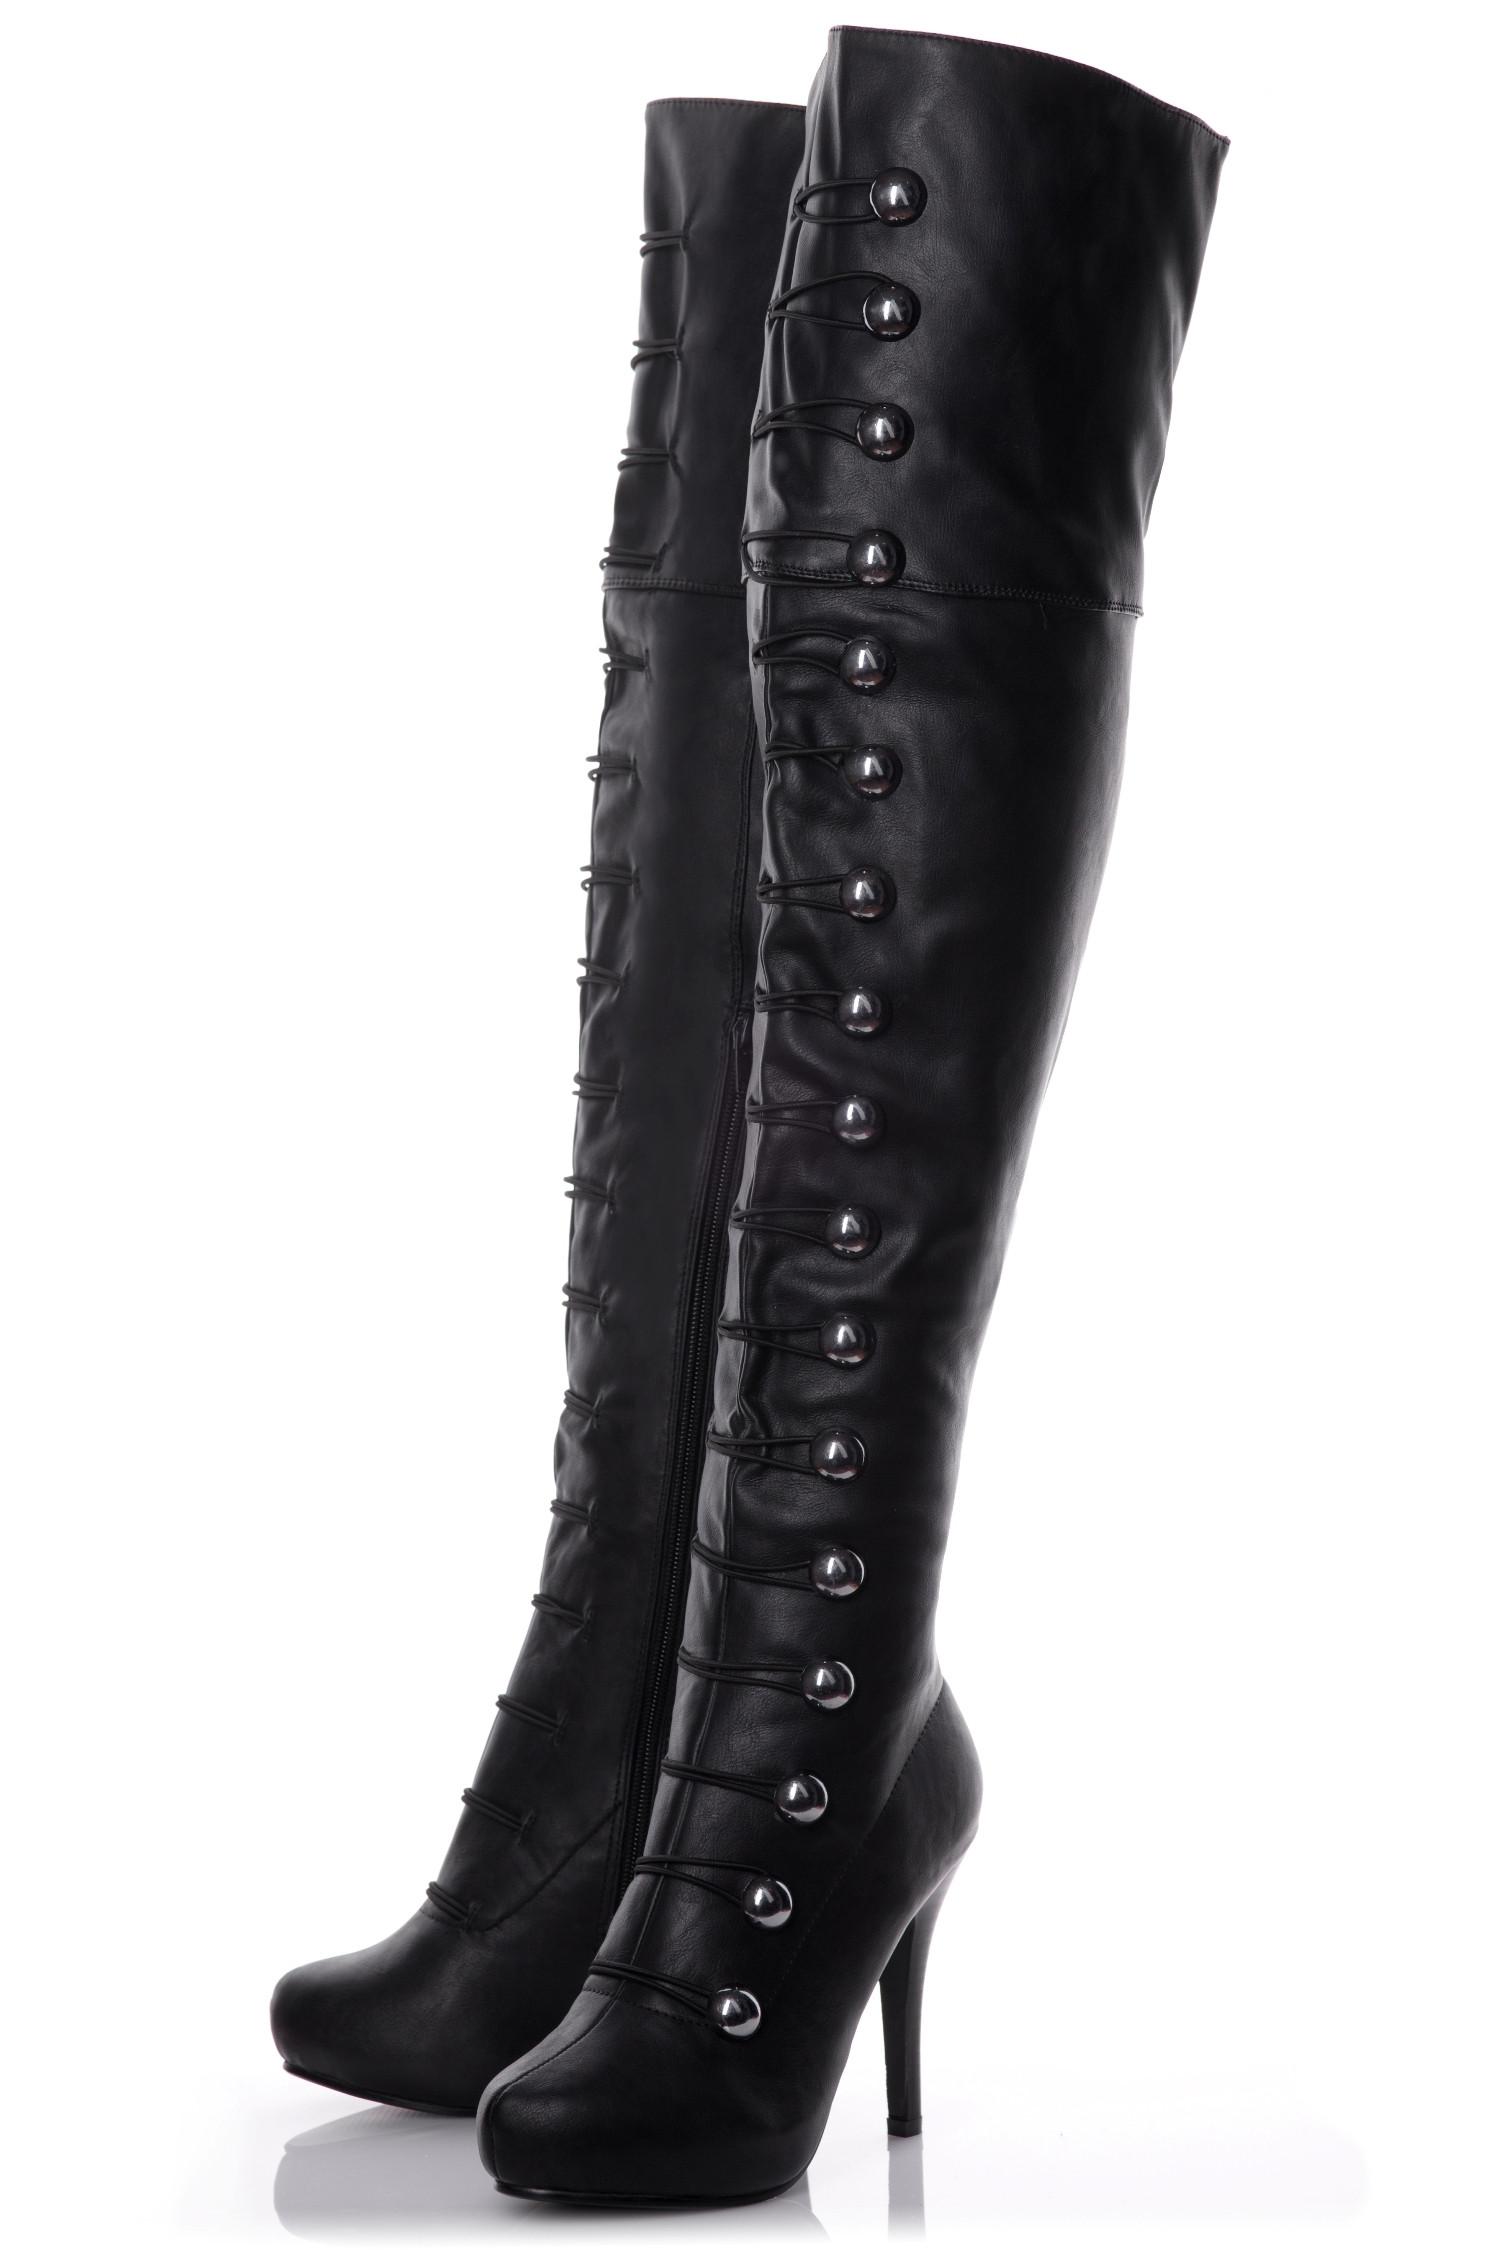 Playgirl Over The Knee Black Matt Button Detail Boots